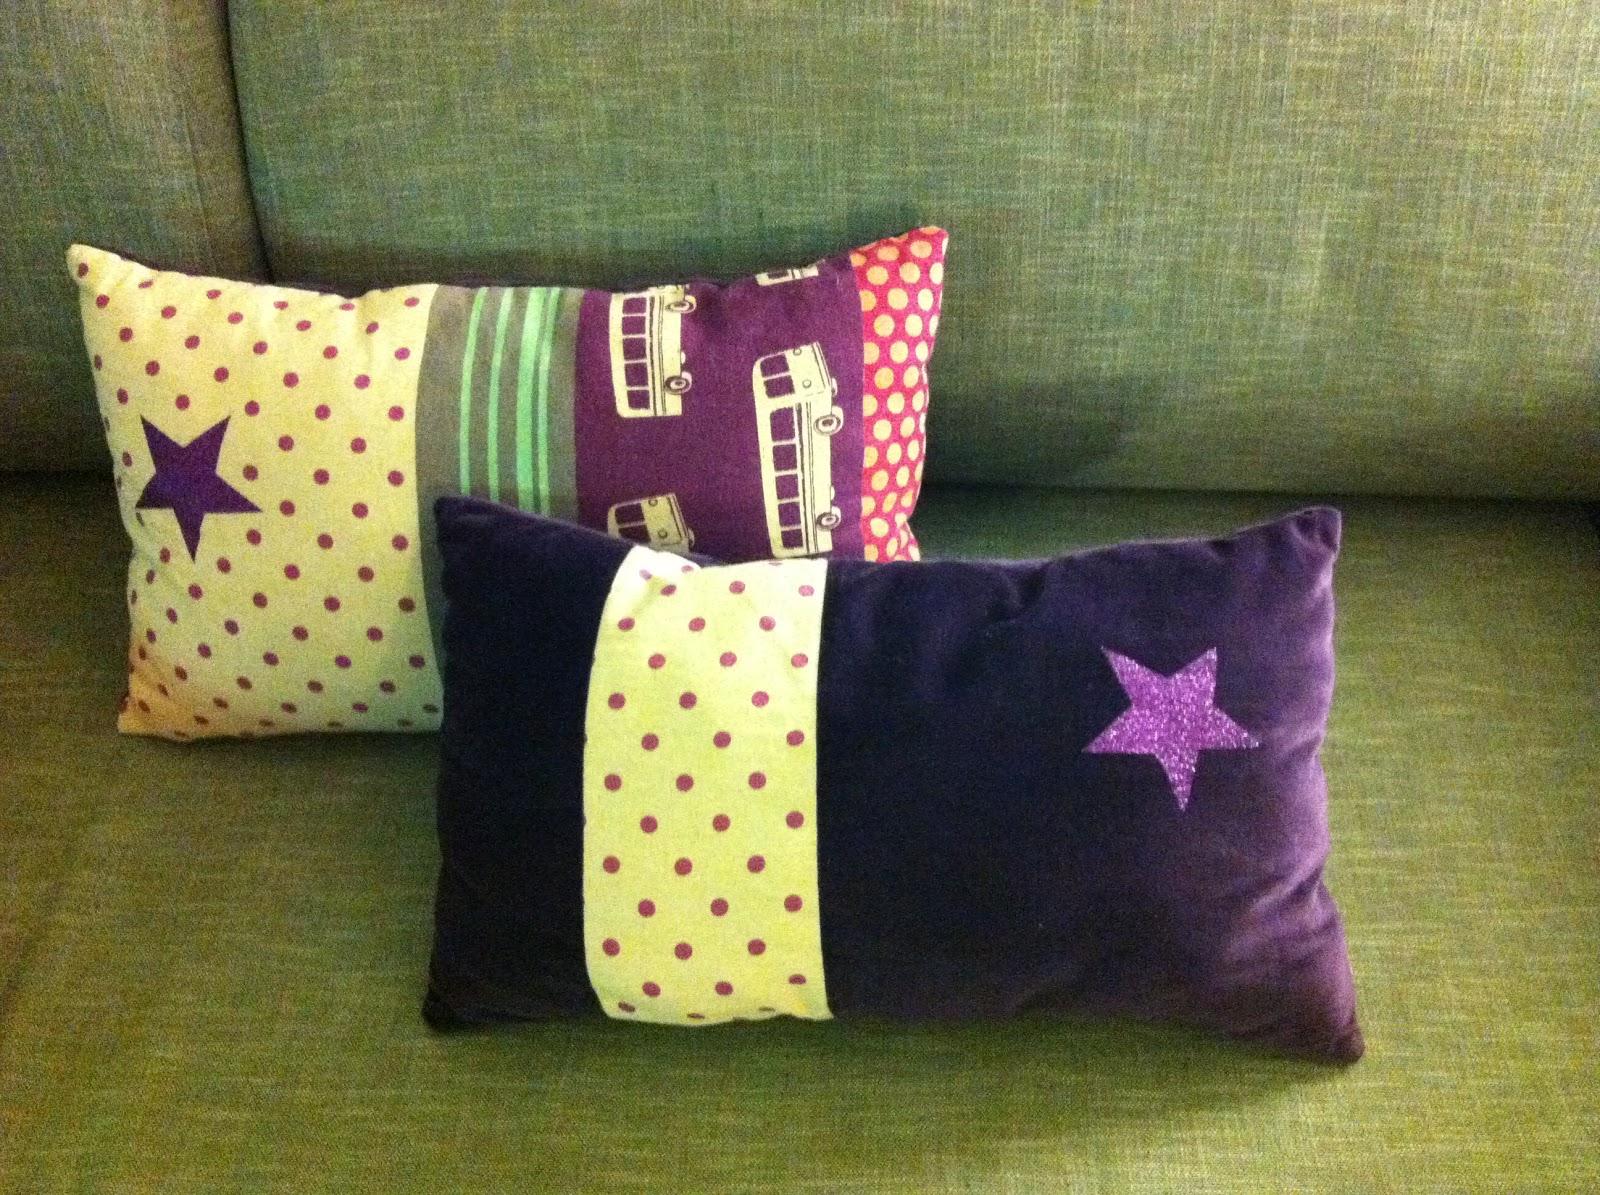 francine et rosalie coussins japonais. Black Bedroom Furniture Sets. Home Design Ideas